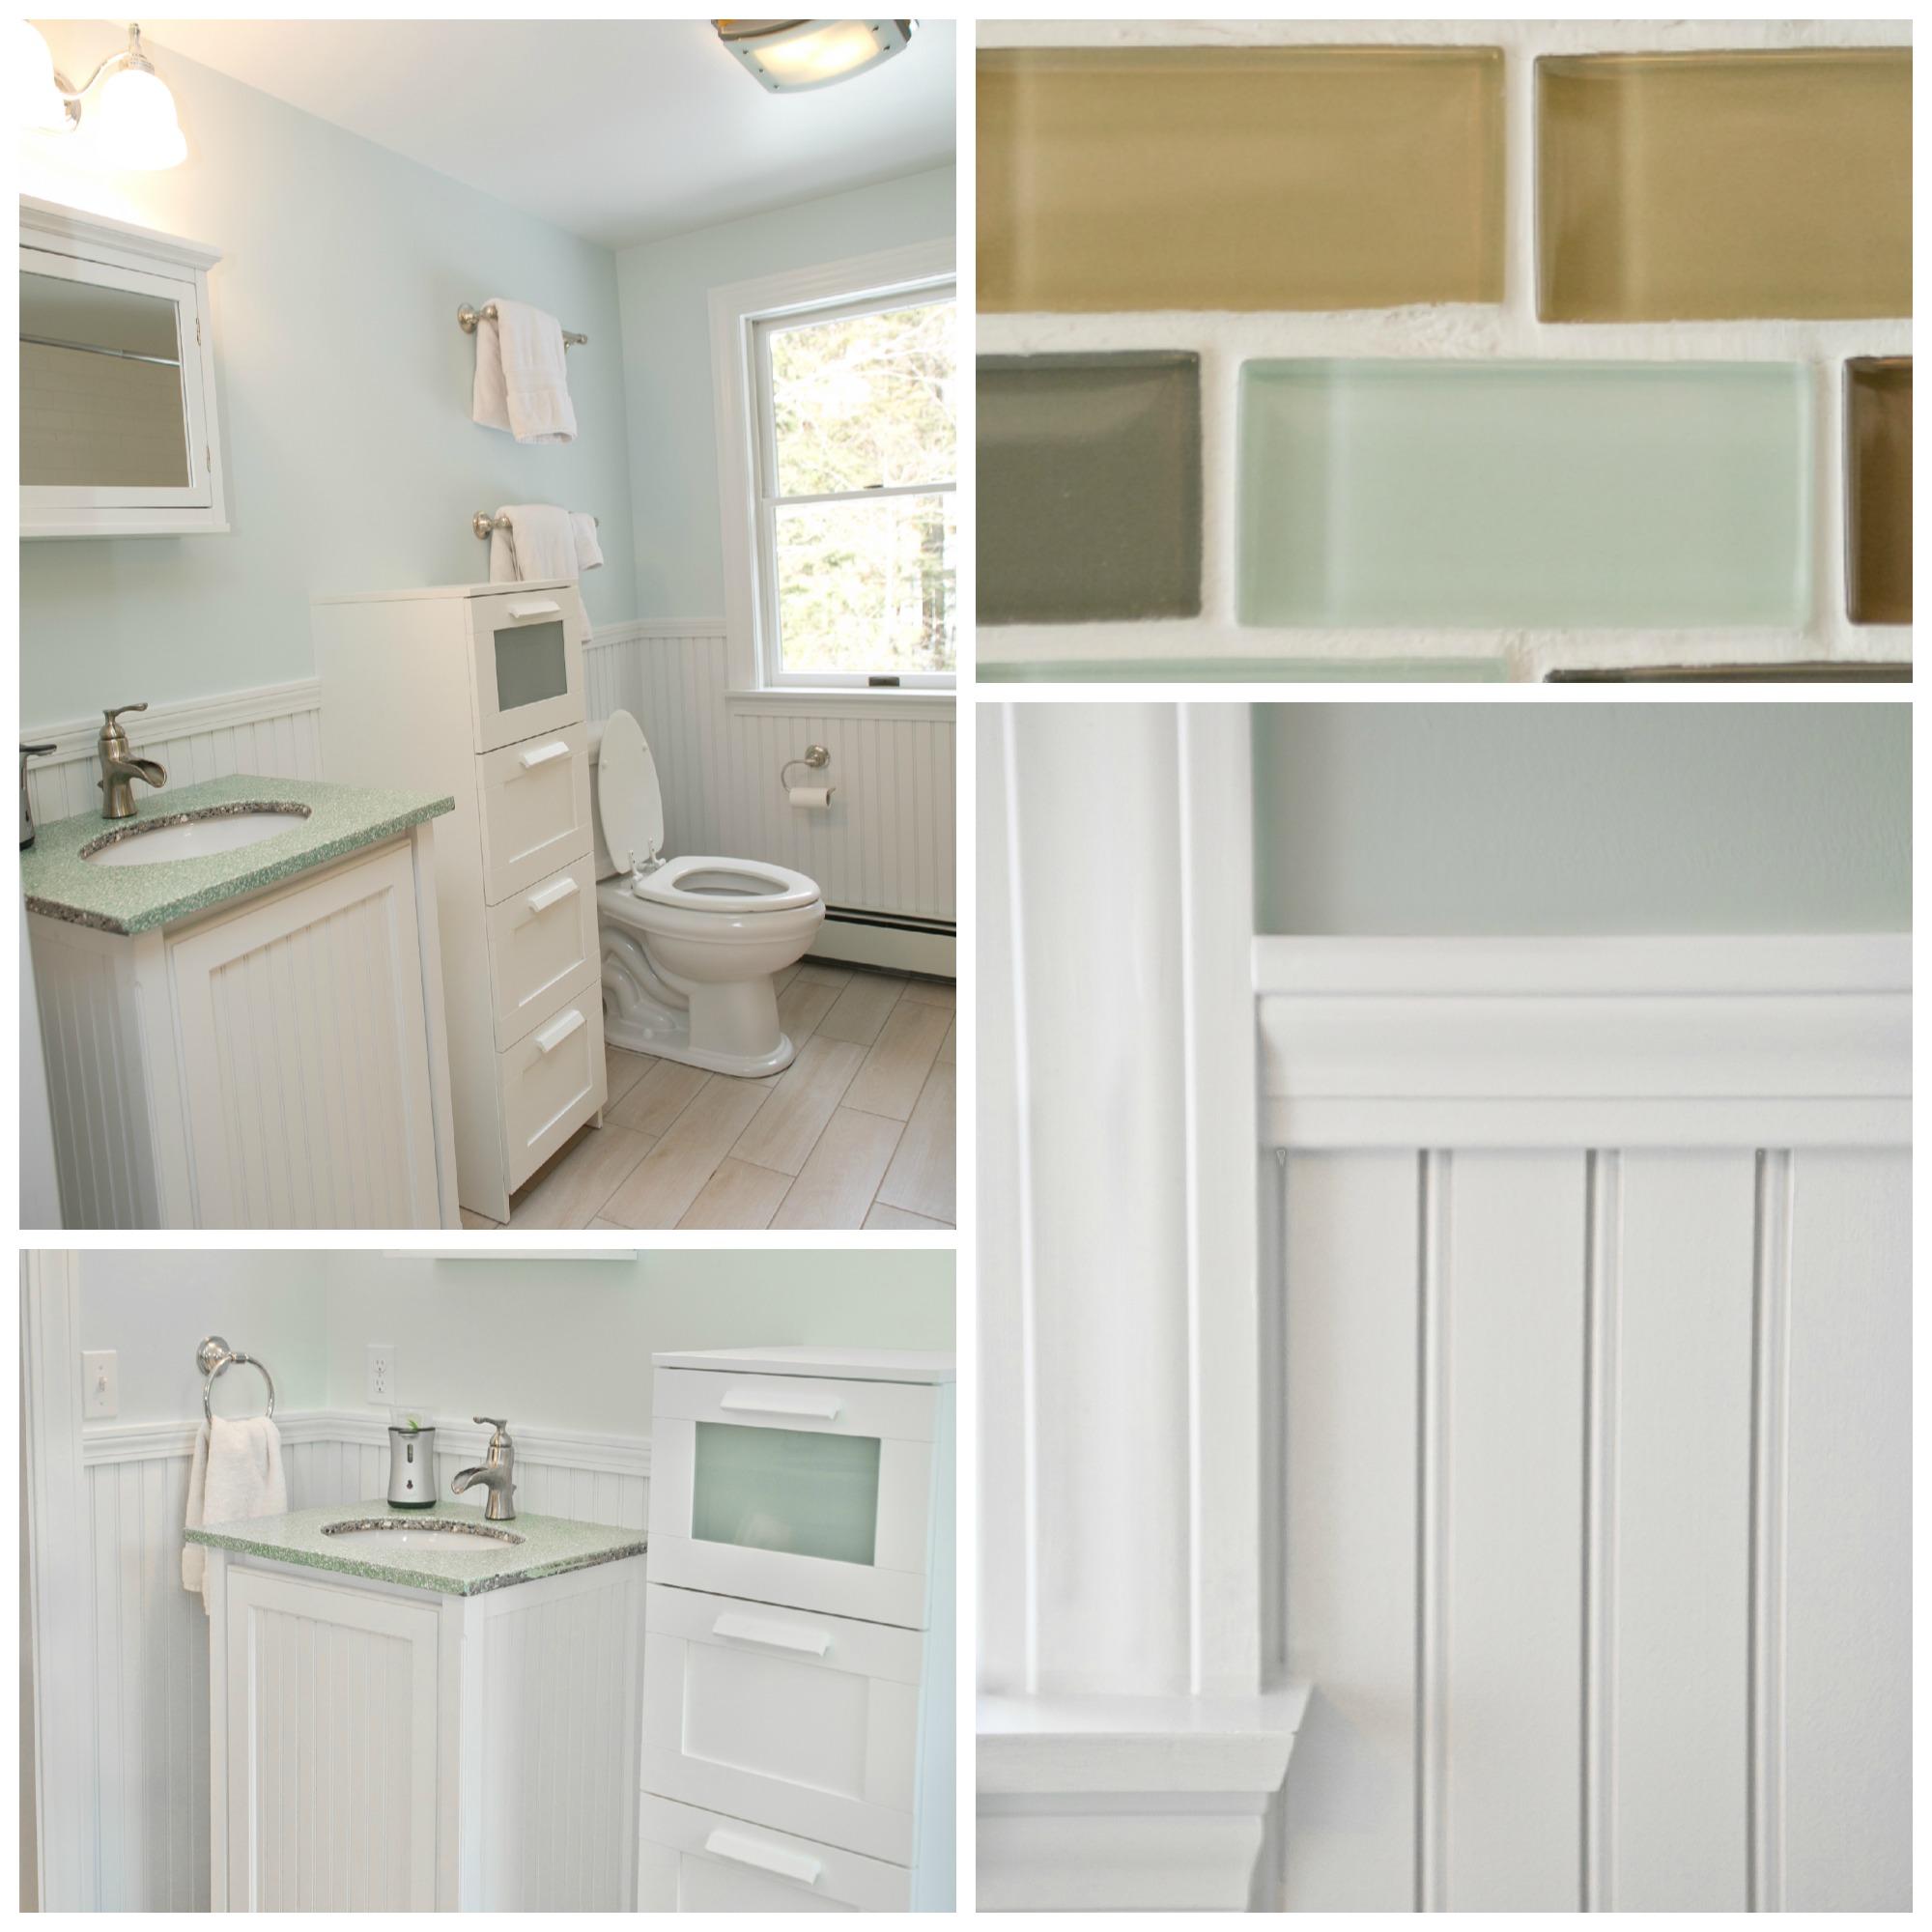 Budgeting for a small bathroom – Celia Bedilia